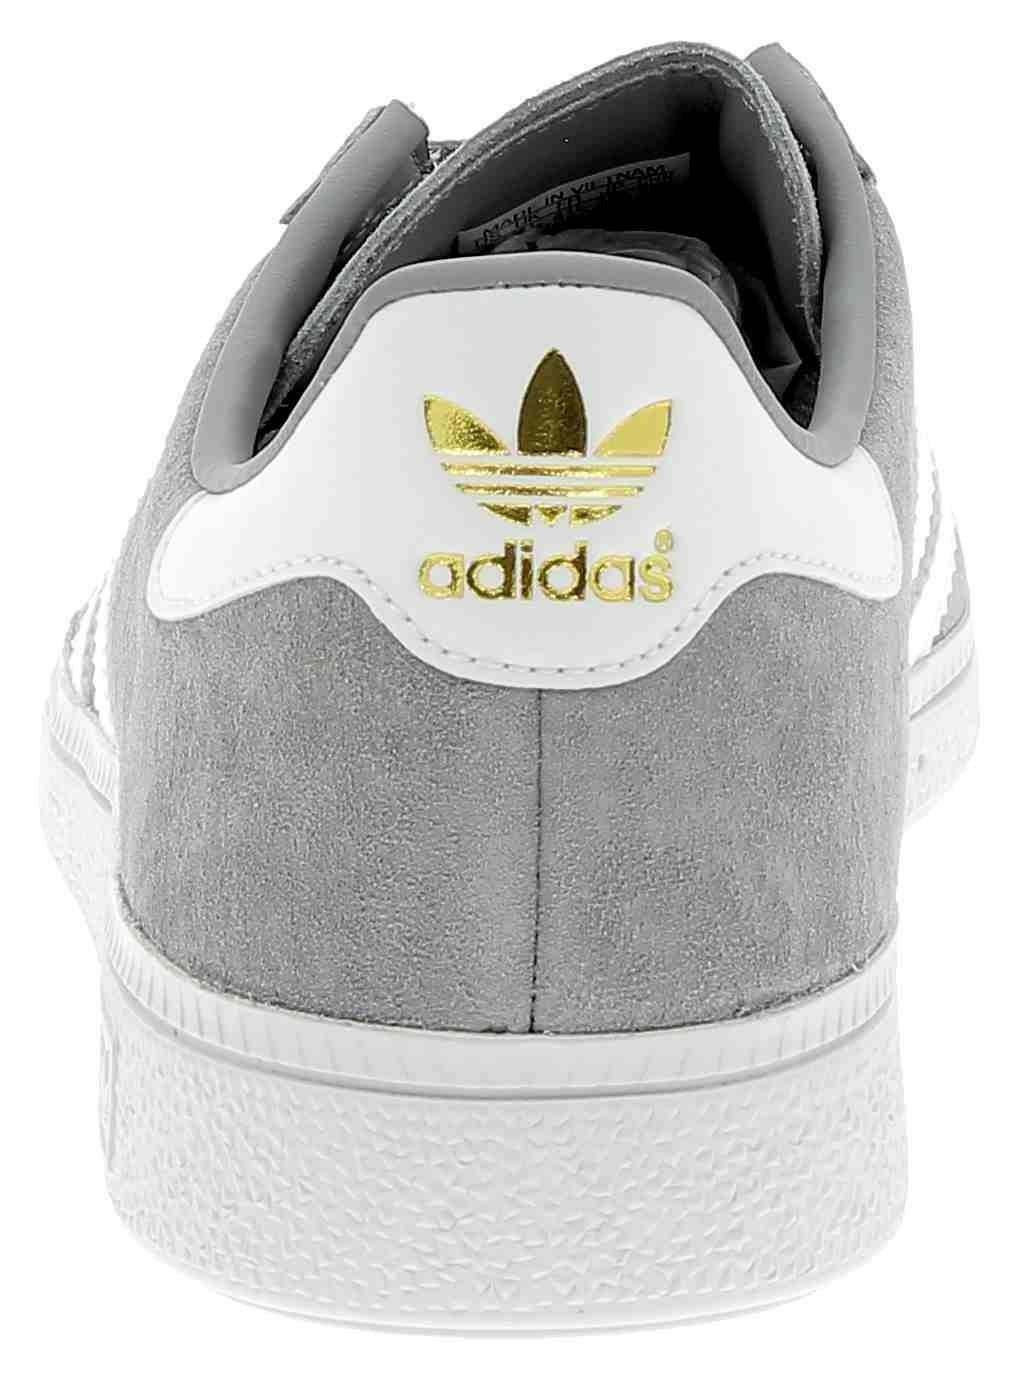 adidas adidas originals munchen scarpe sportive uomo grigie